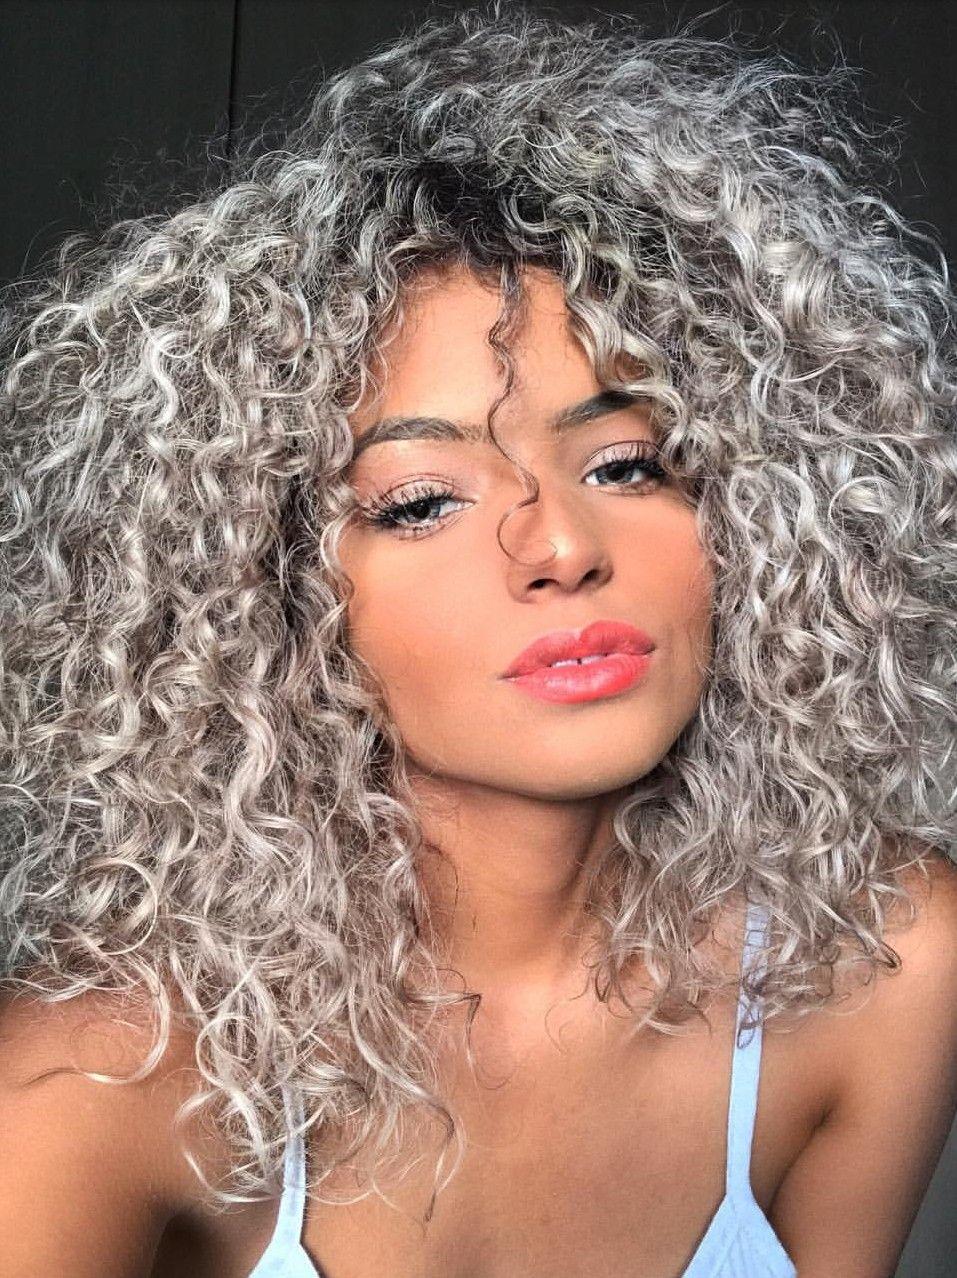 Pin By Francine Bushrey On Hair Color Curly Hair Styles Colored Curly Hair Curly Silver Hair